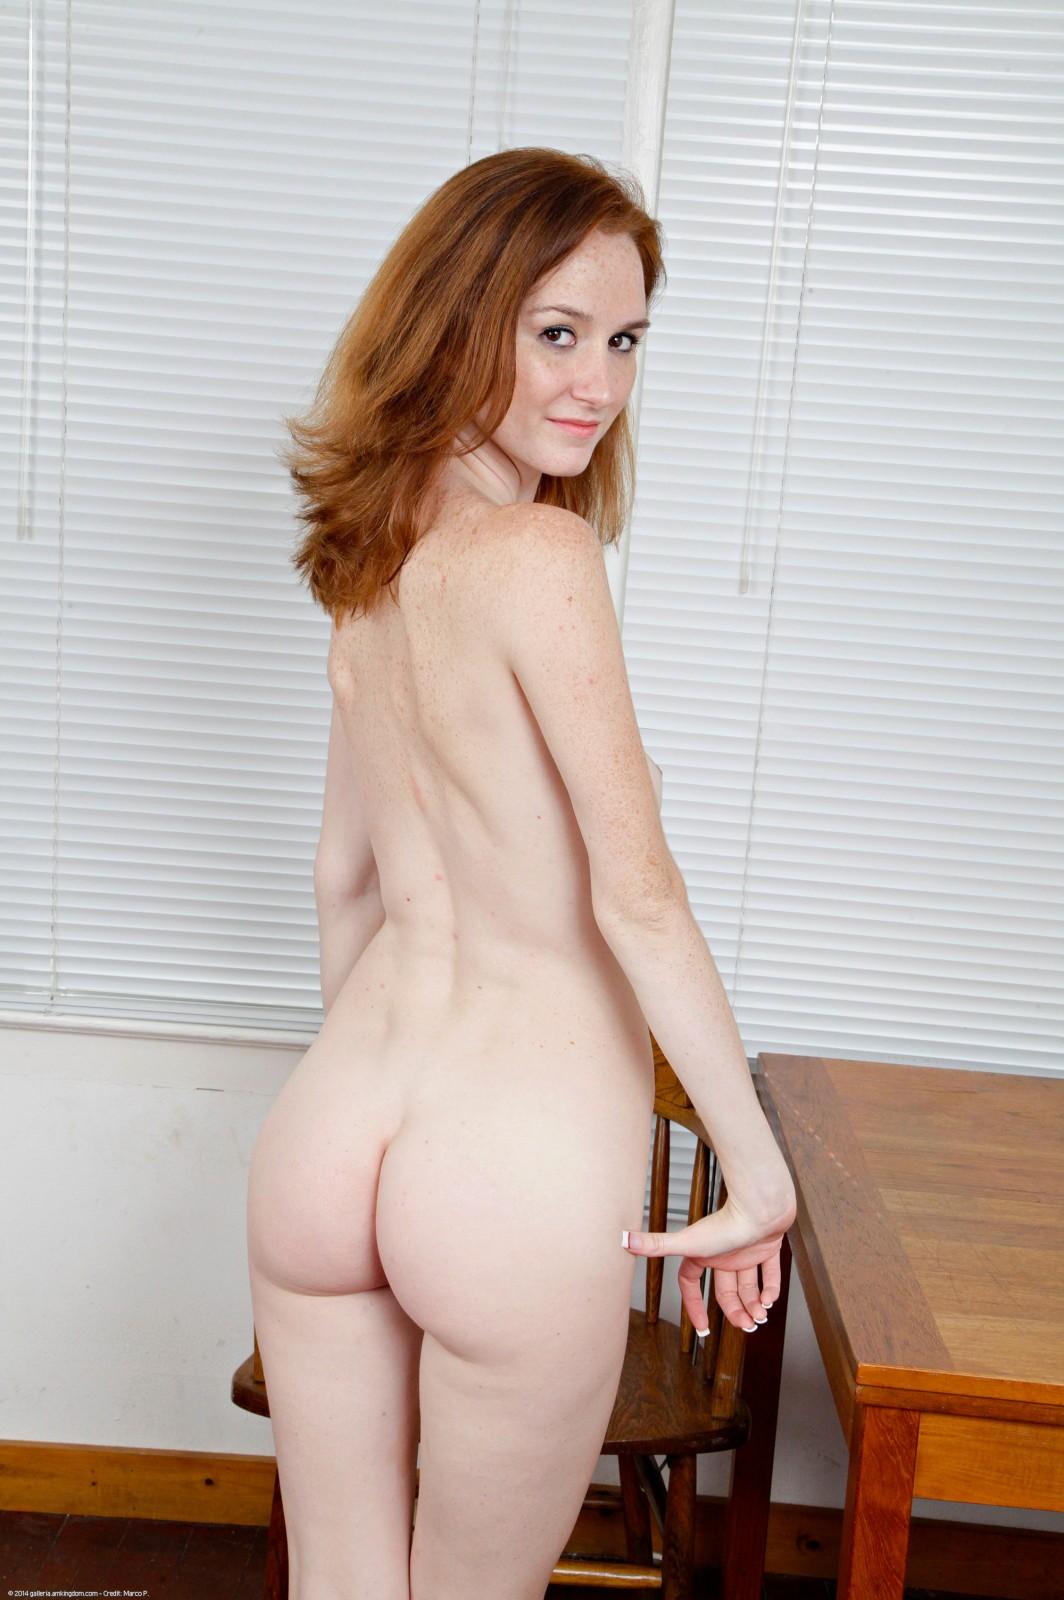 Dee Lynn Big